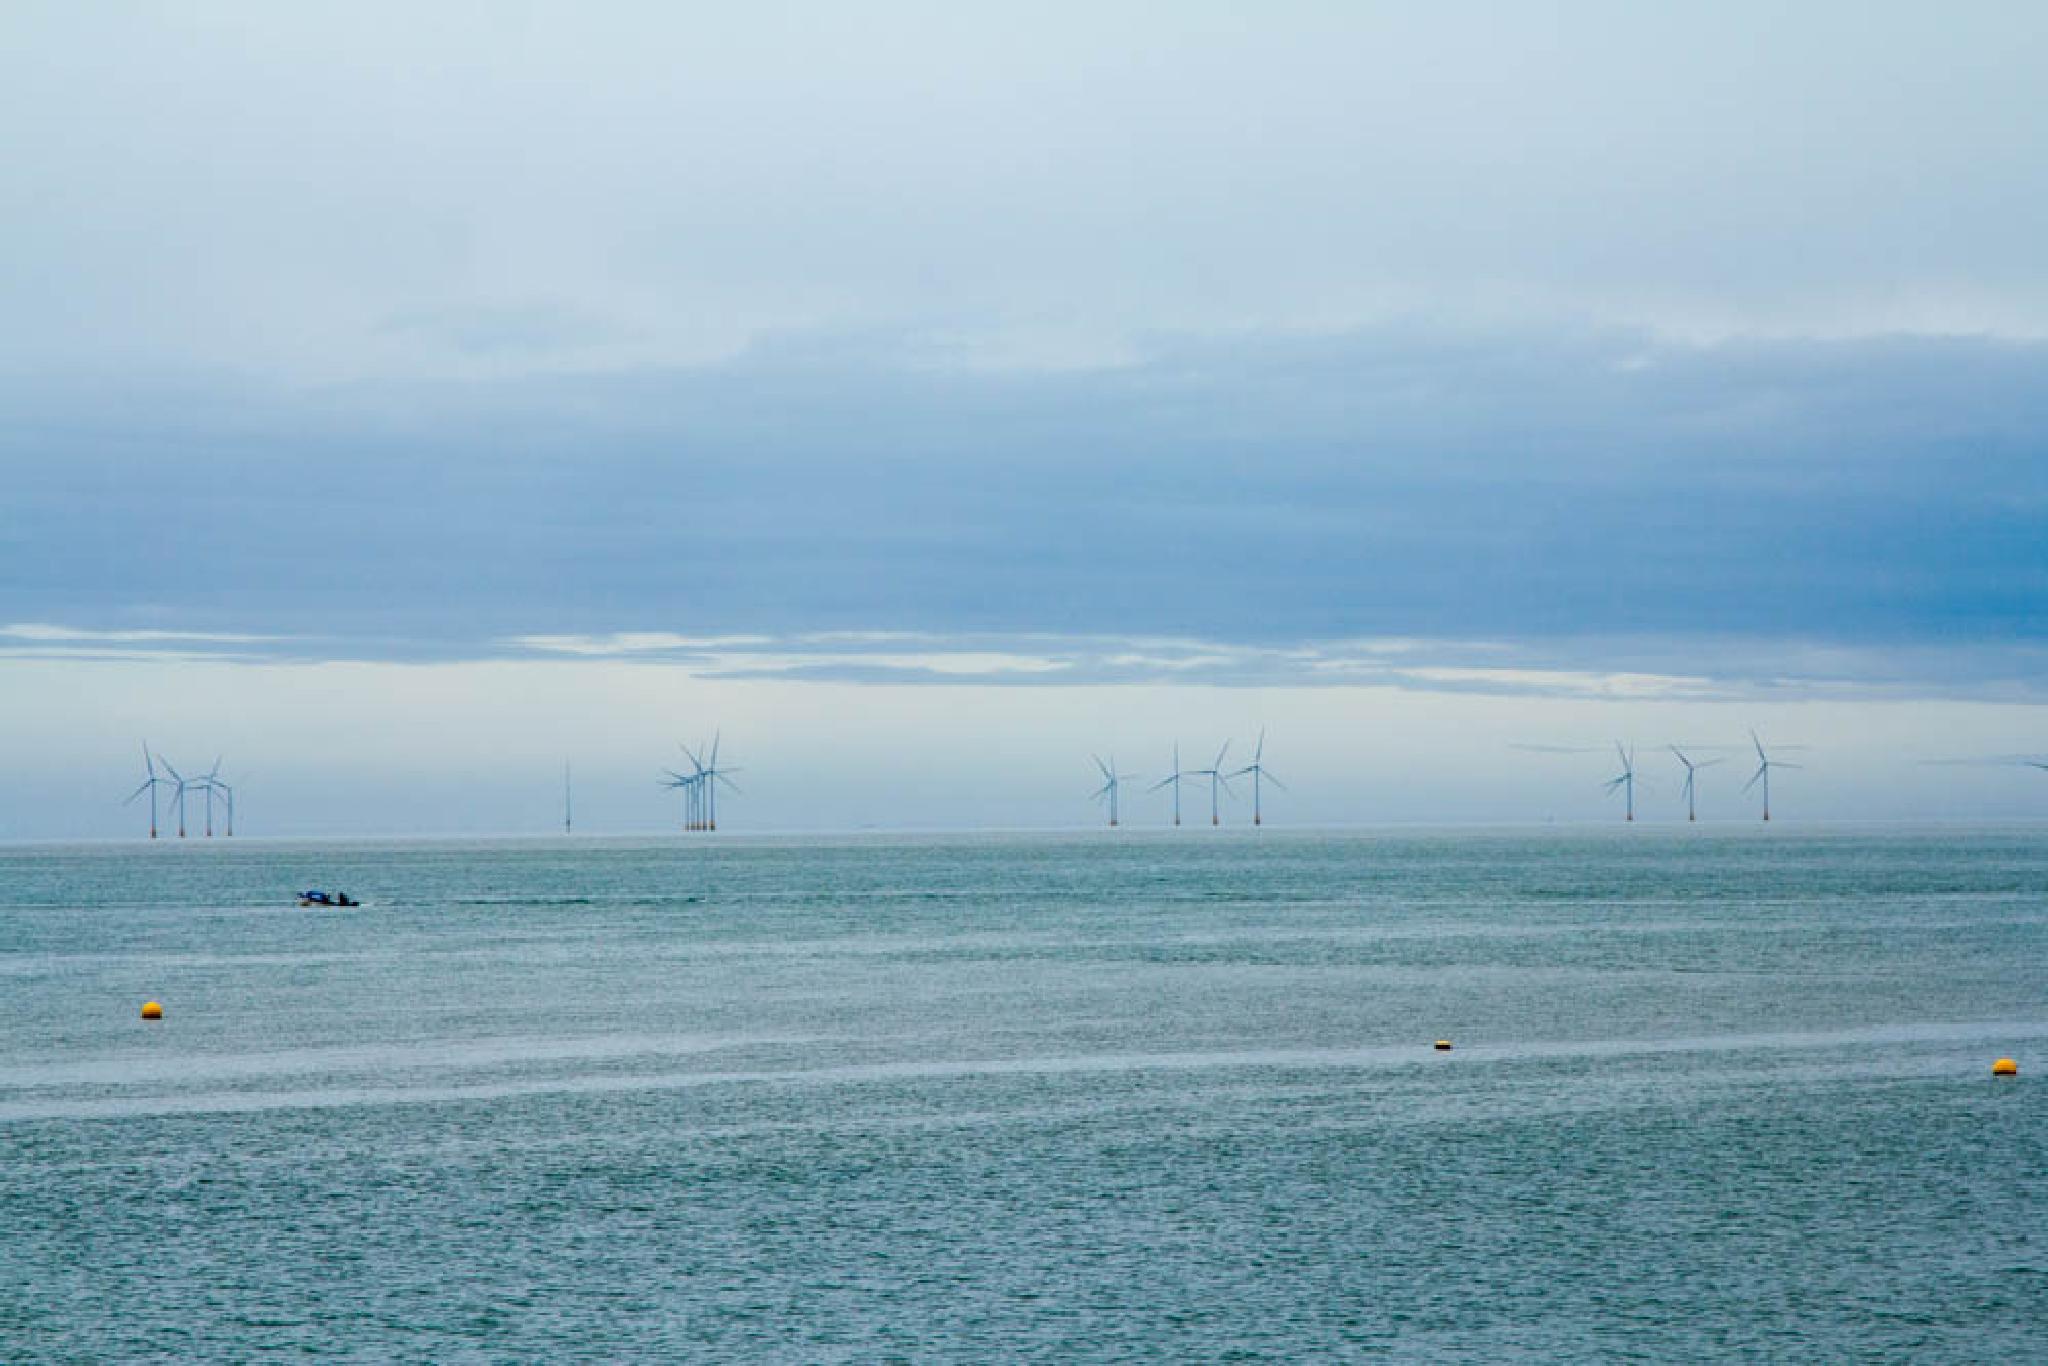 Windfarm off Whitstable beach Kent by Scottie